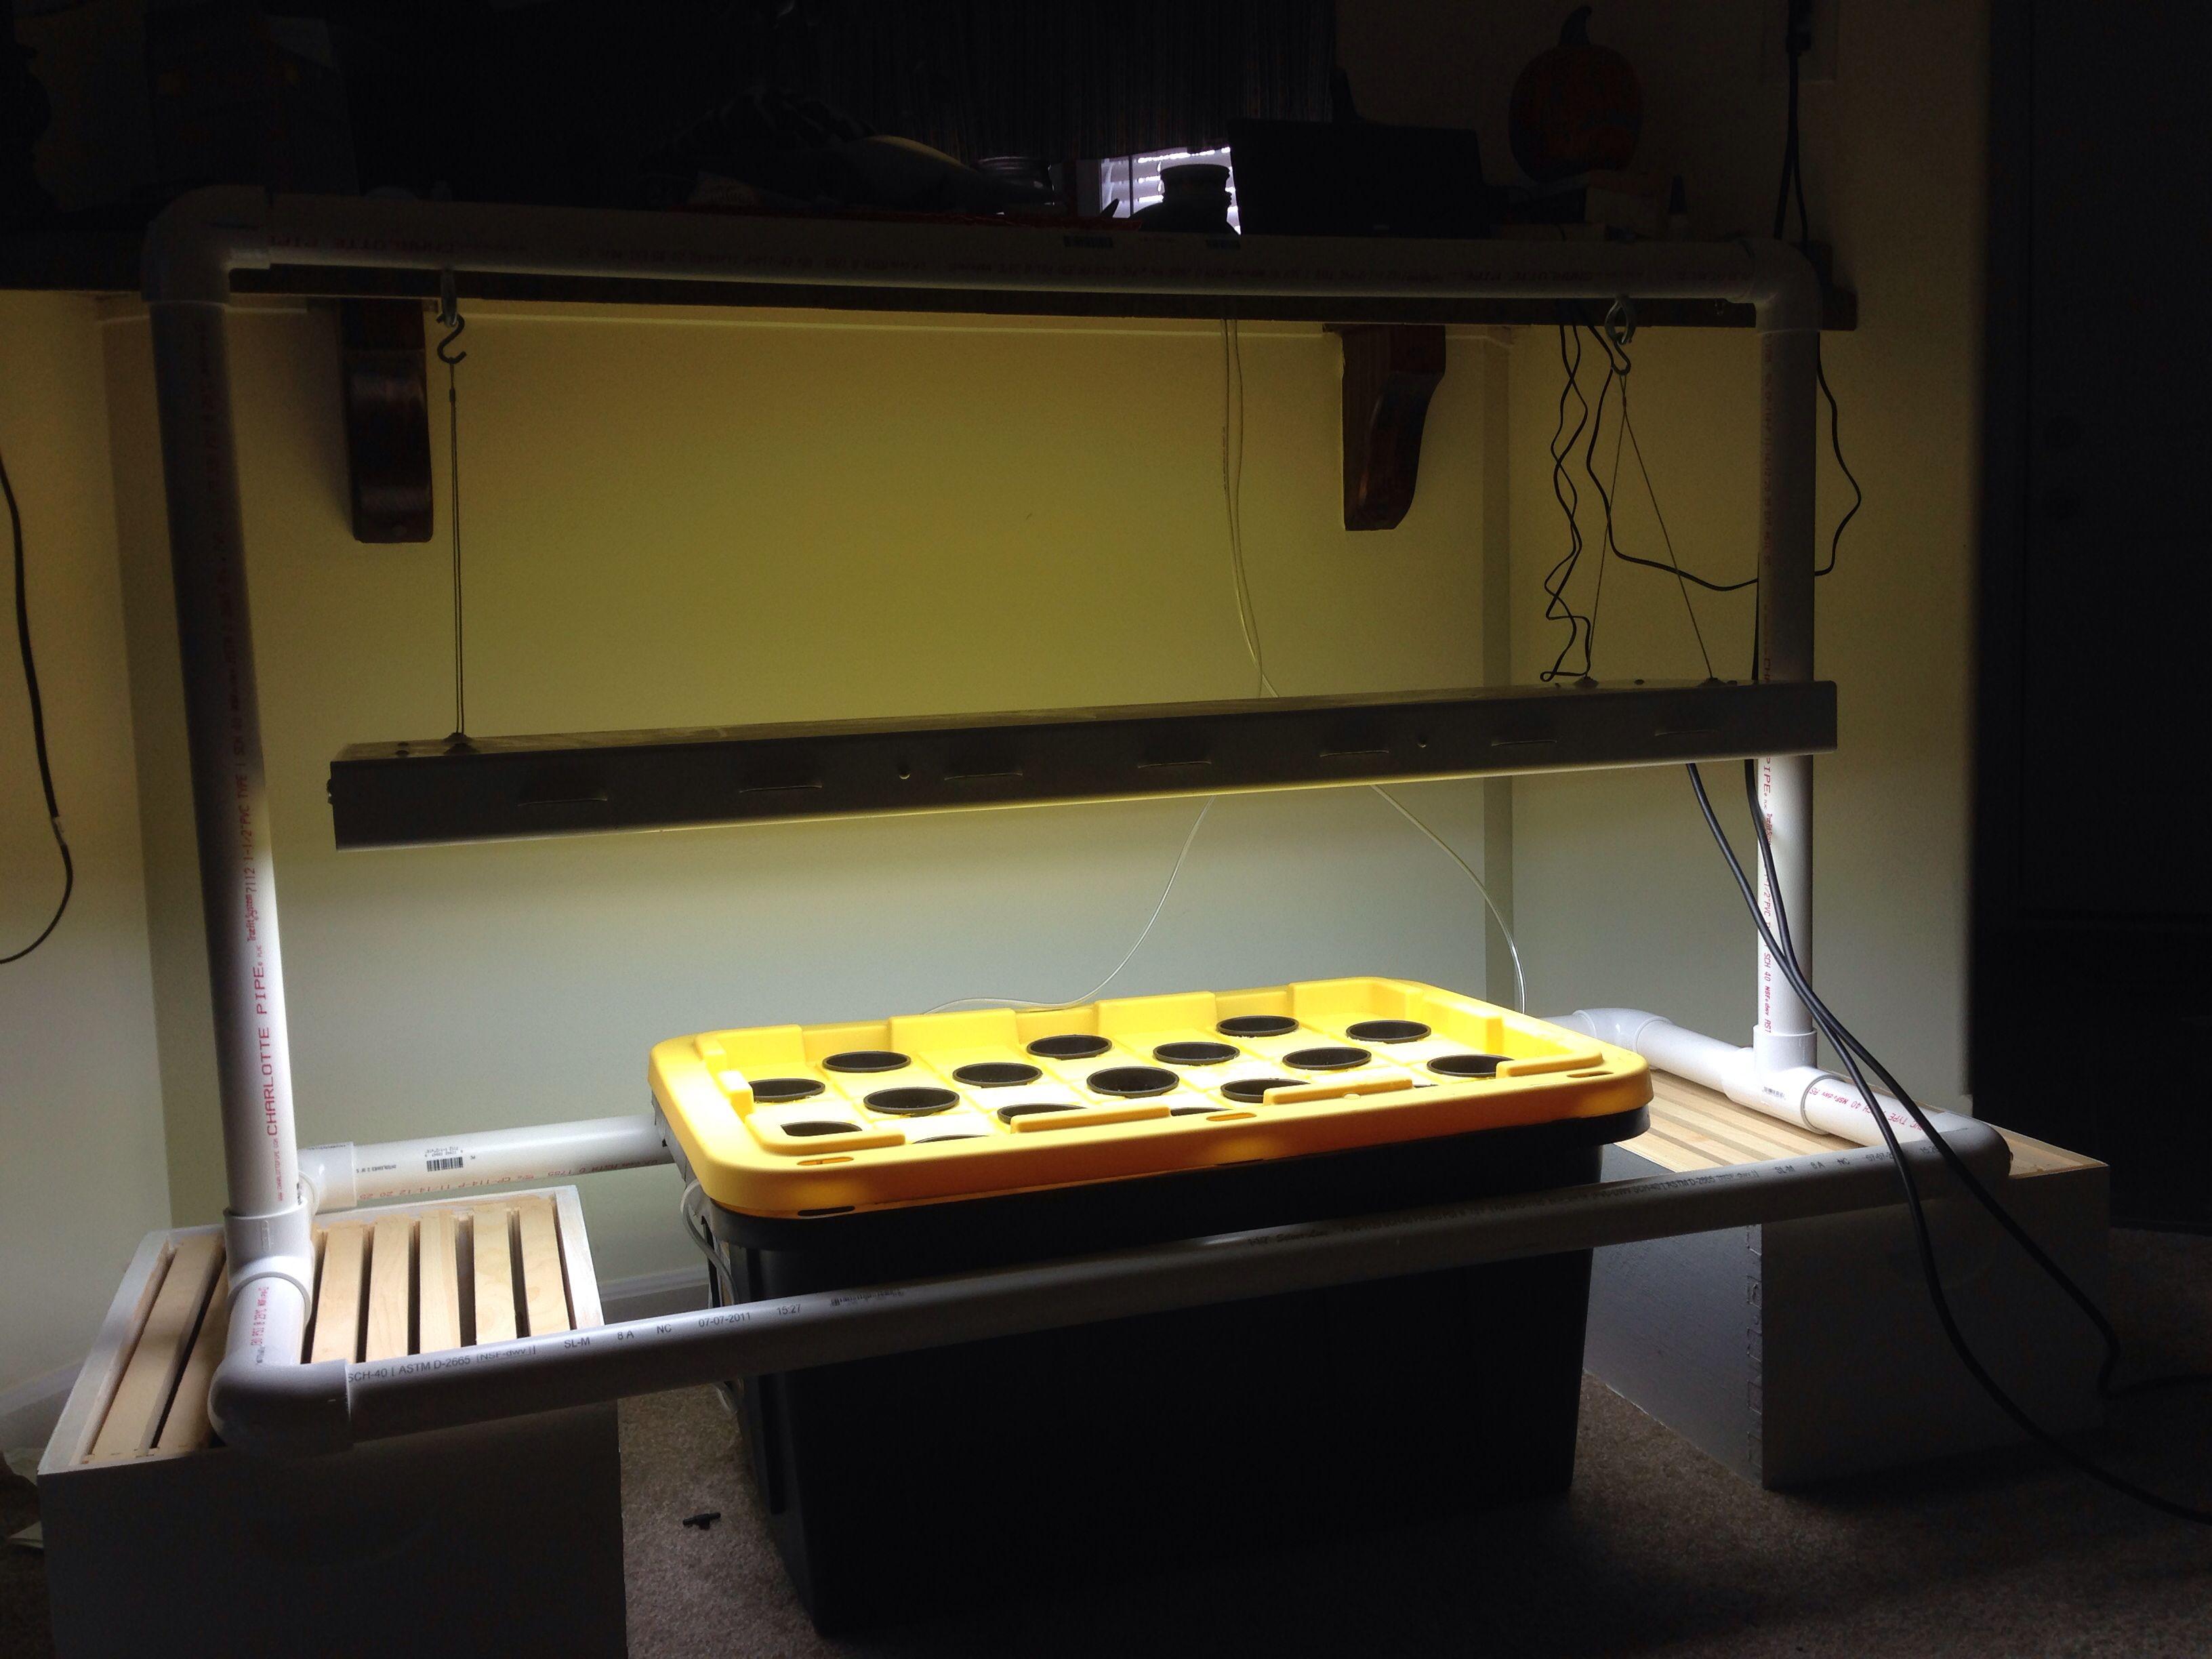 My Hydroponic Setup 27 Gallon Tote Lowes 30 60 Gallon